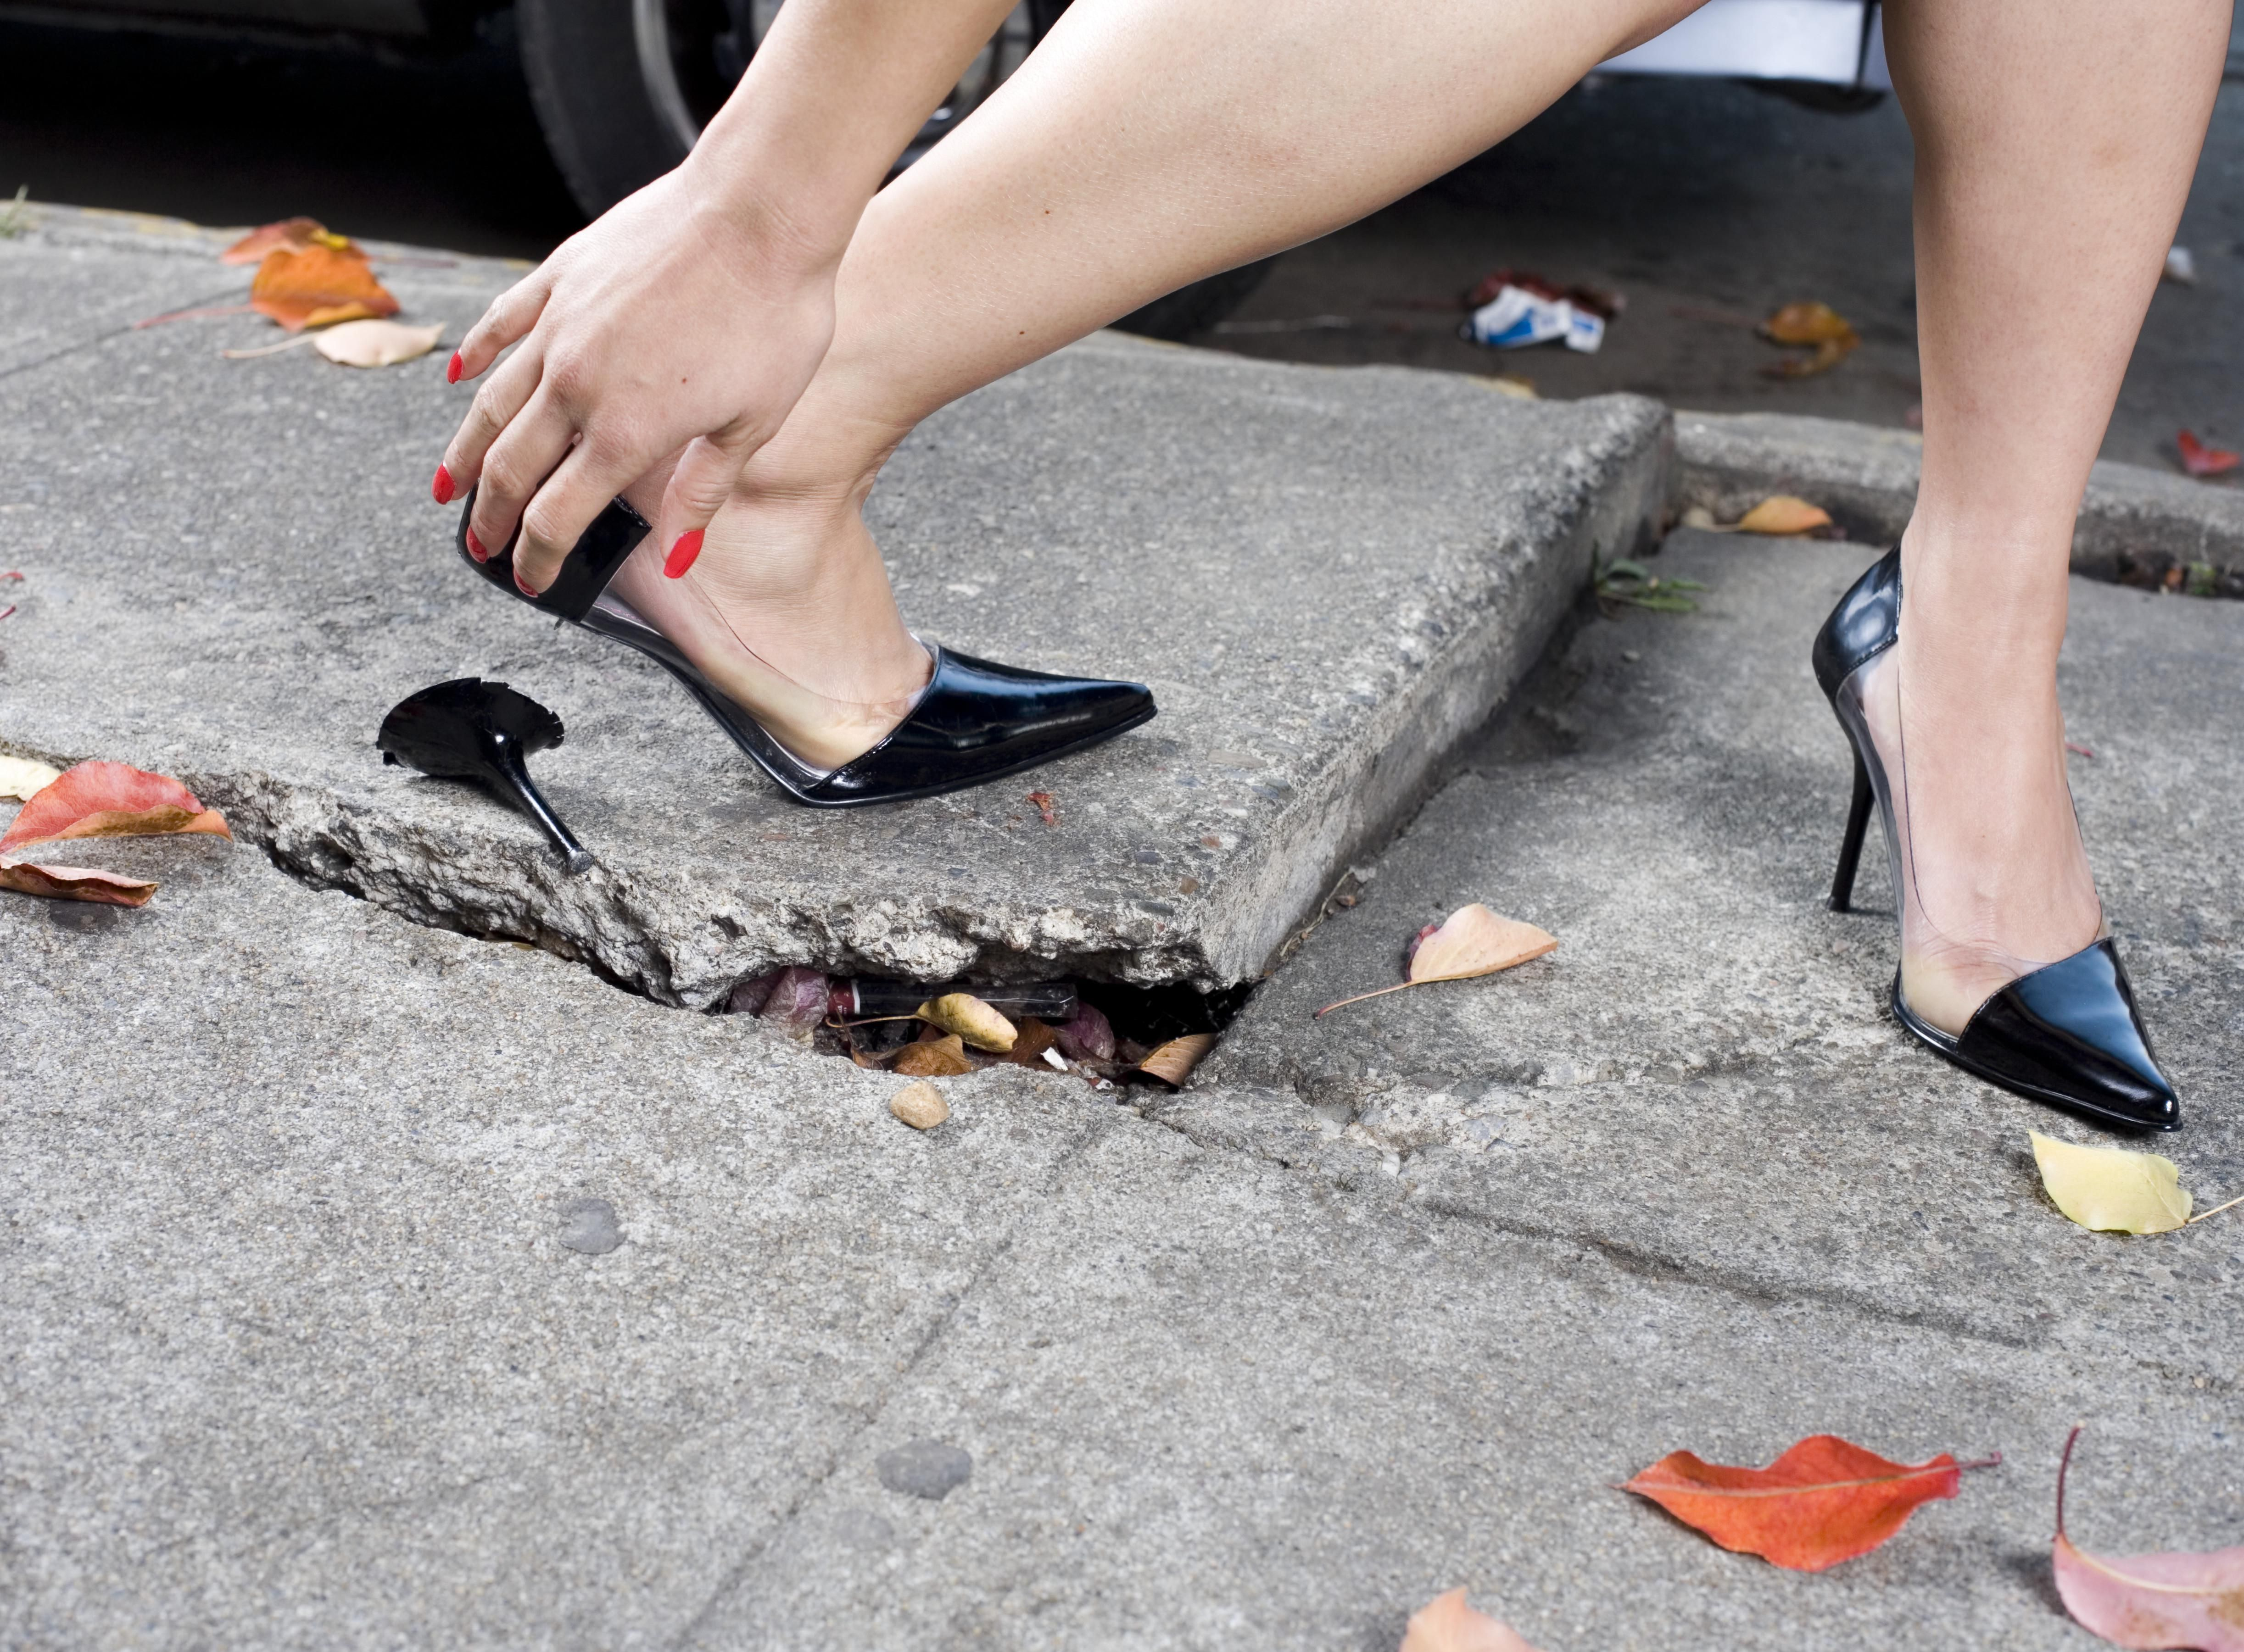 Cum on feet chipped nailpolish - 1 part 5